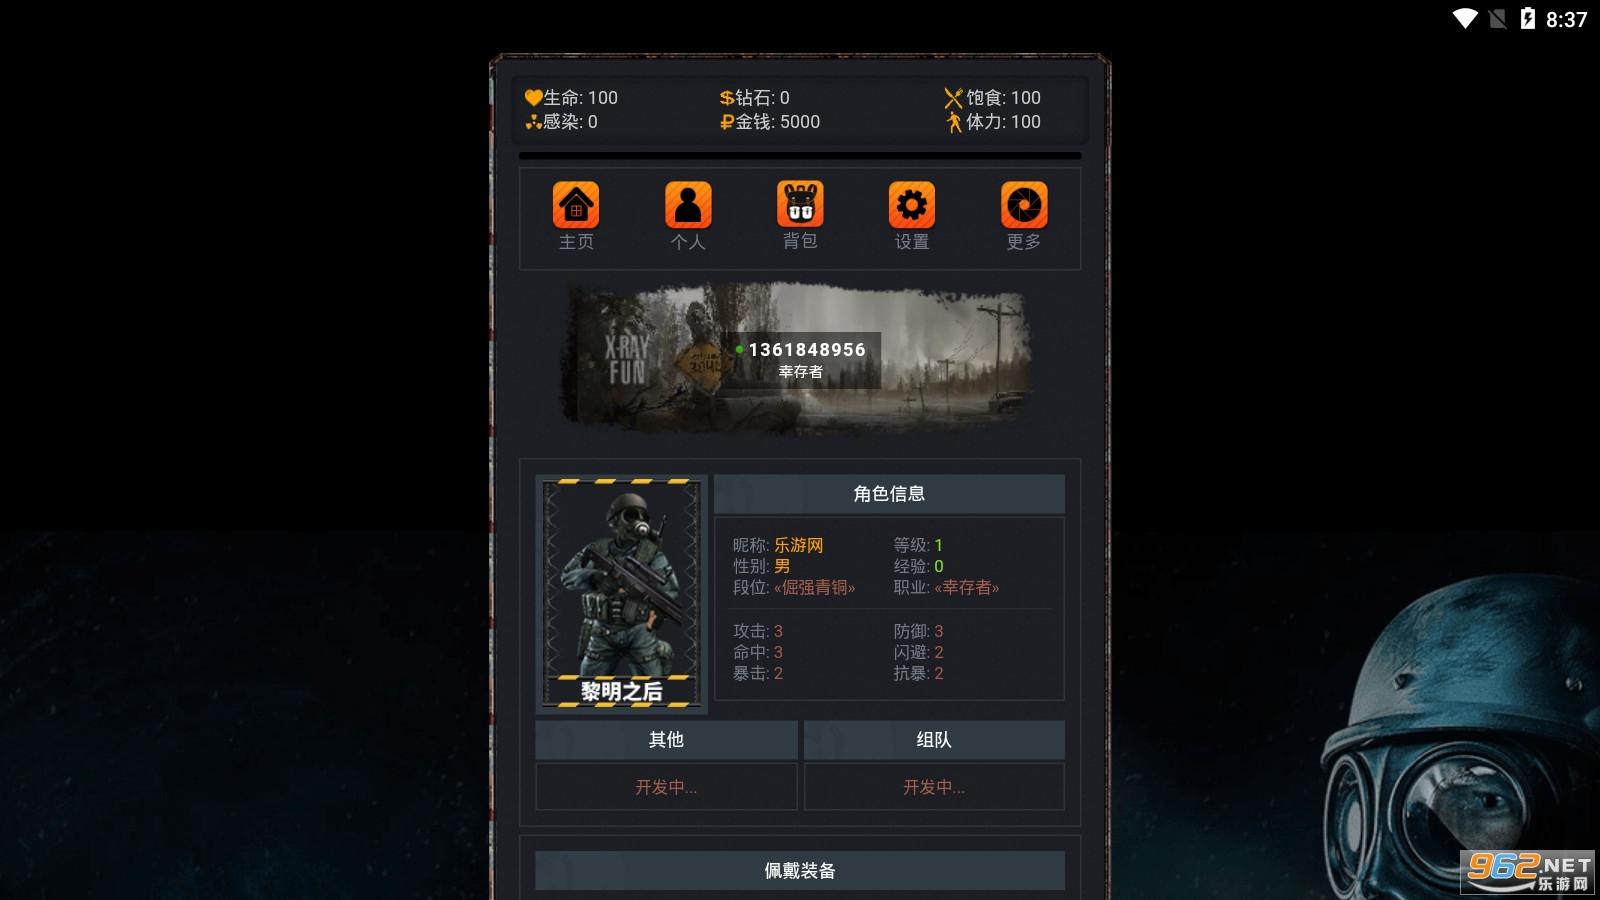 Wap幸存者(内测服)v2.0中文版截图1